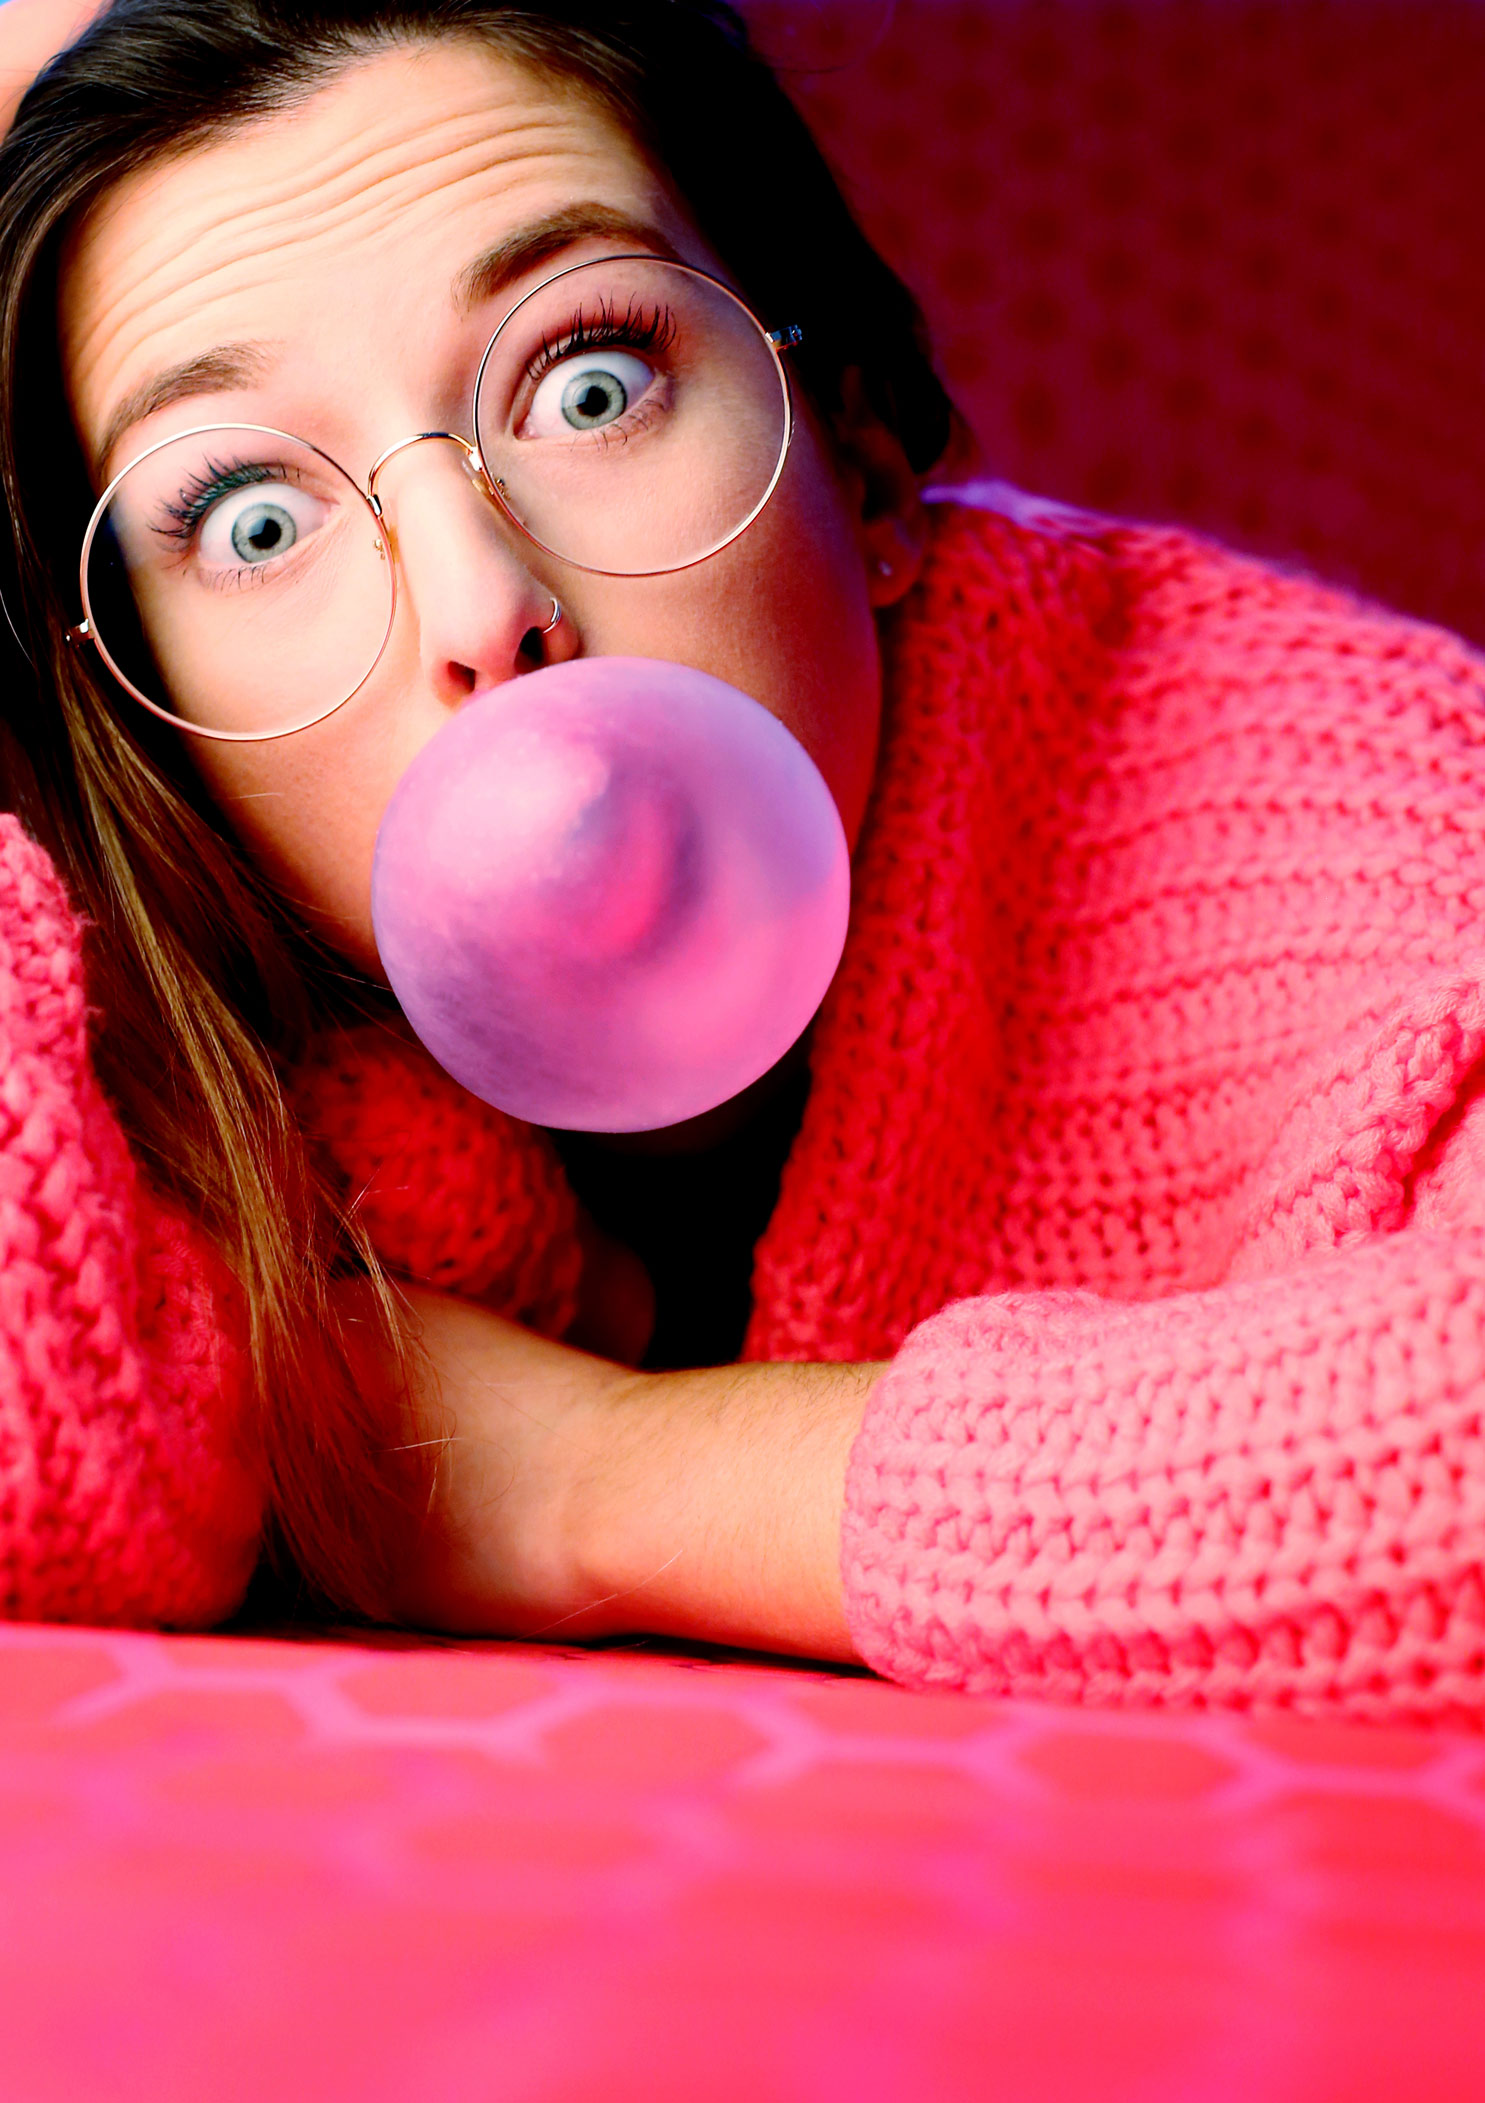 Kaugummiblase think pink Portrait